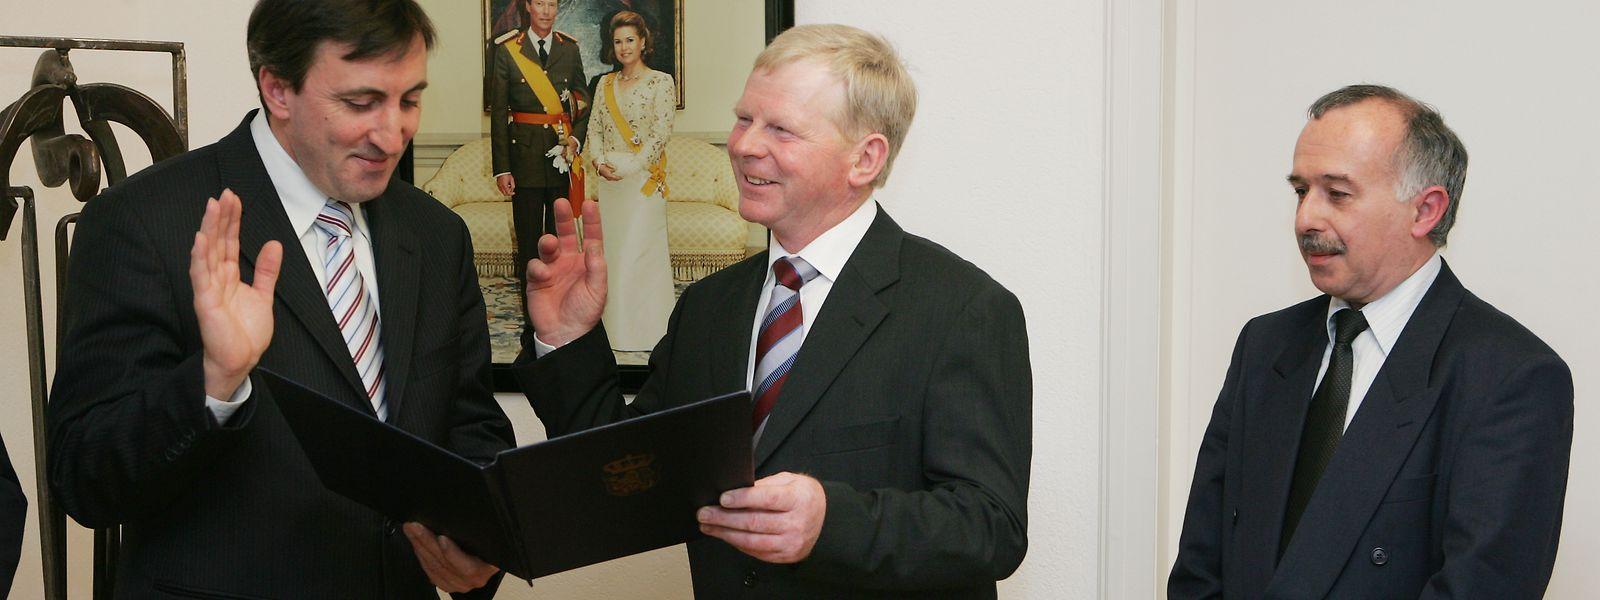 René Daubenfeld (rechts) bei seiner Vereidigung zum Bürgermeister im Dezember 2005.